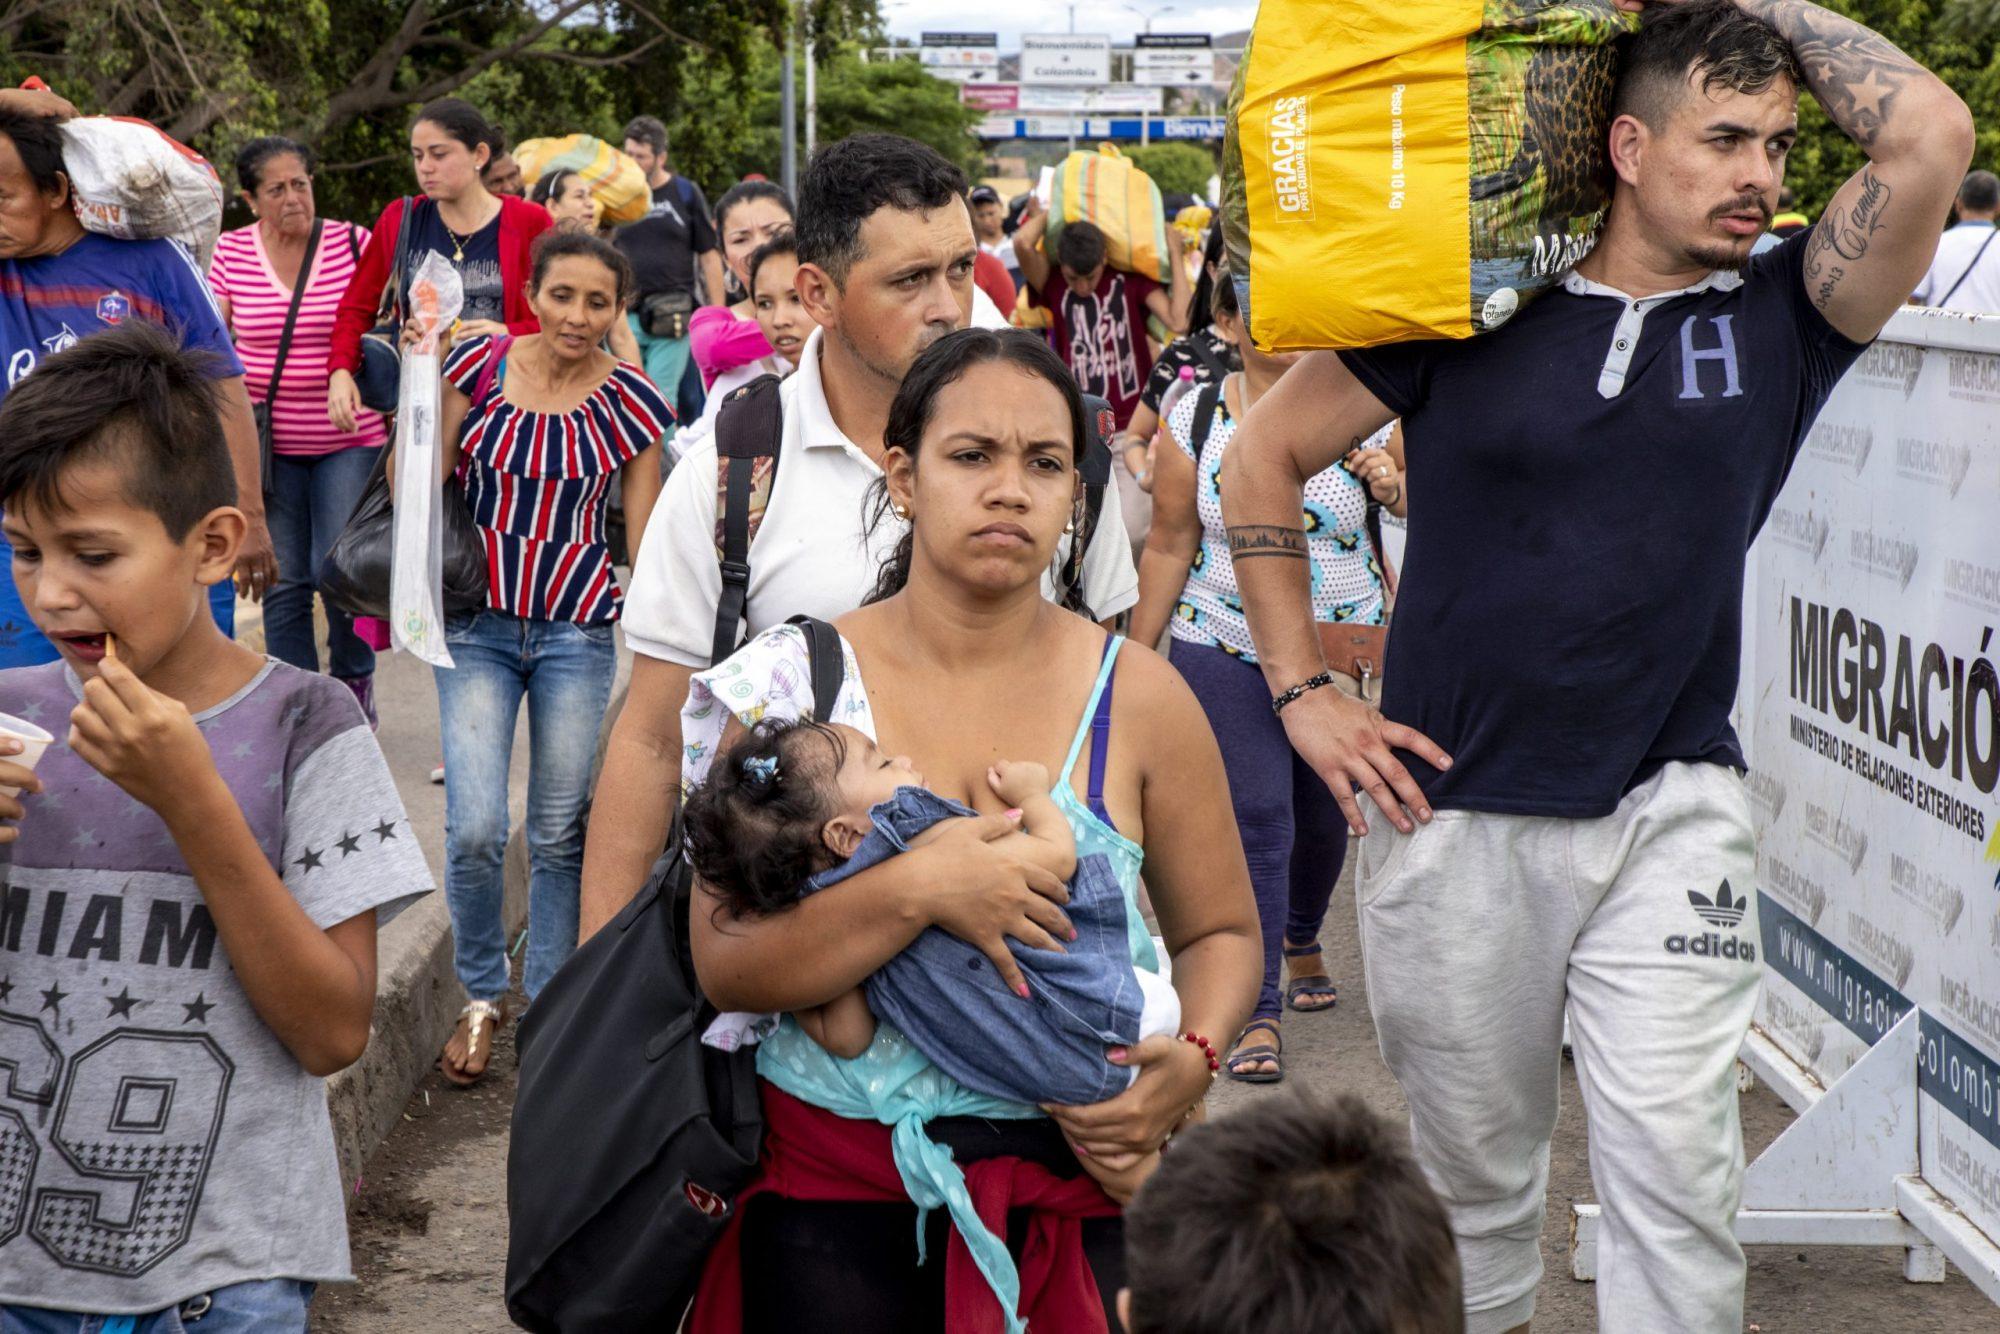 2010 June - Economic war in Venezuela (IMB.org)